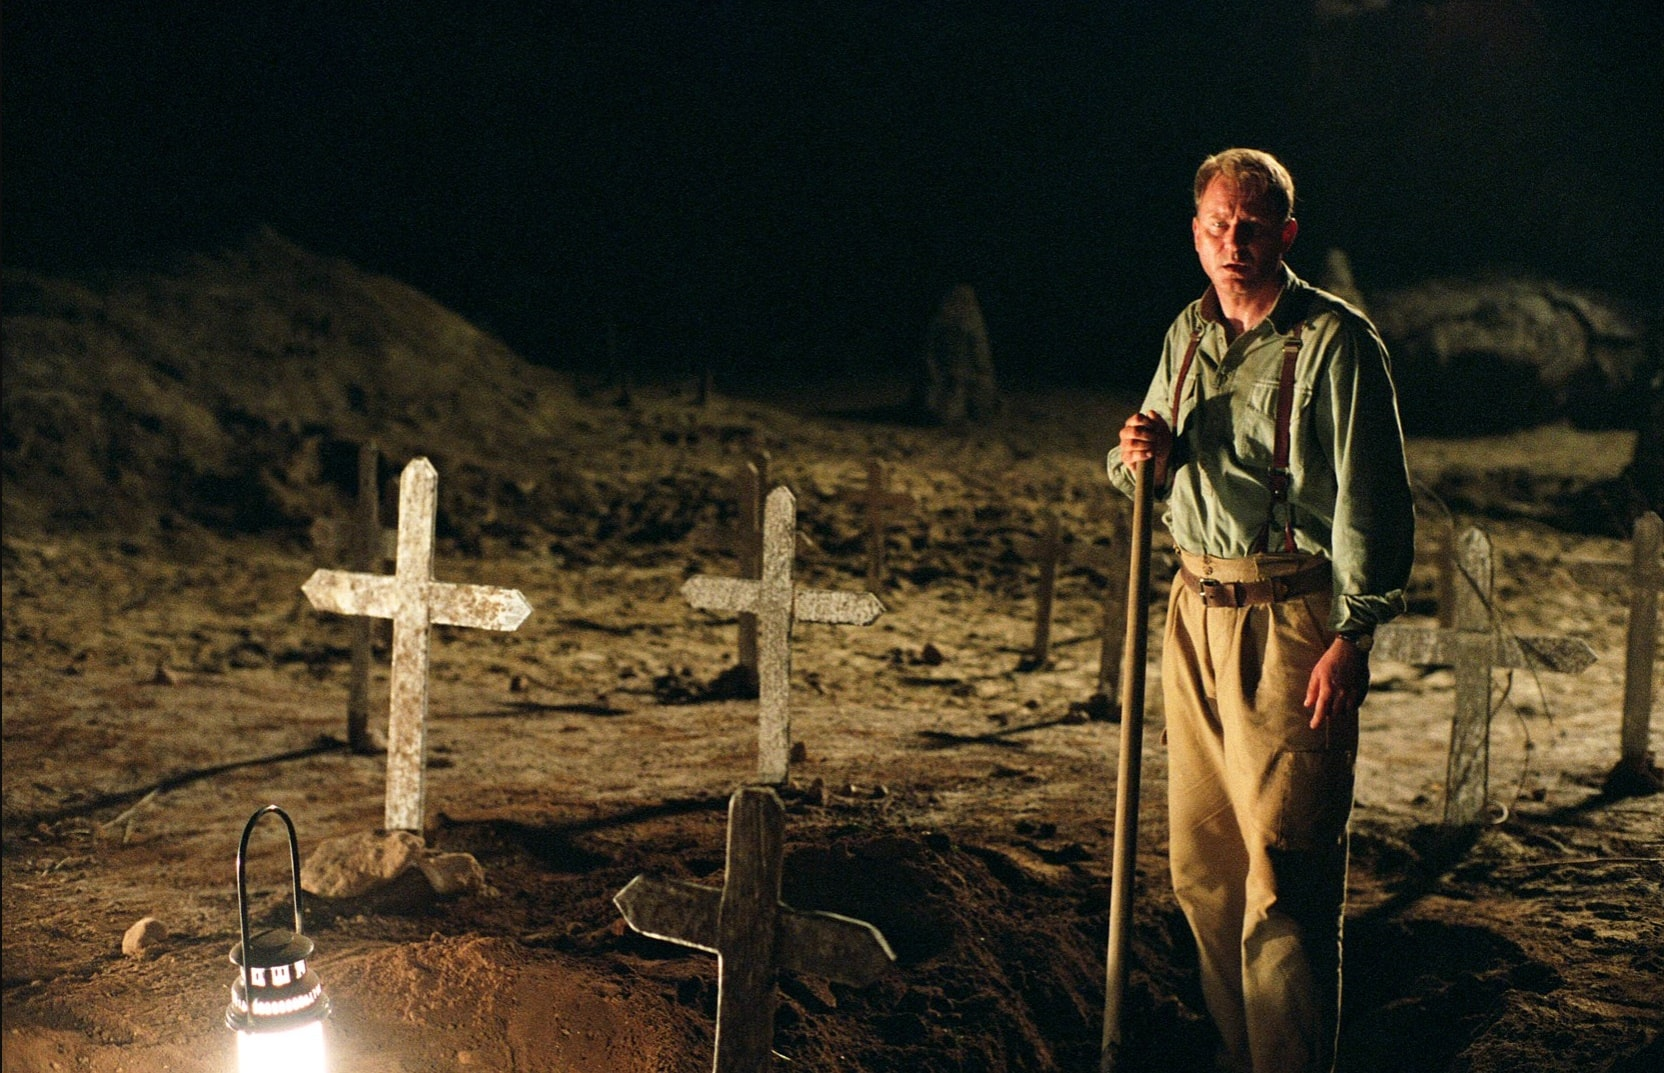 Изгоняющий дьявола: Начало / Exorcist: The Beginning (2004): кадр из фильма